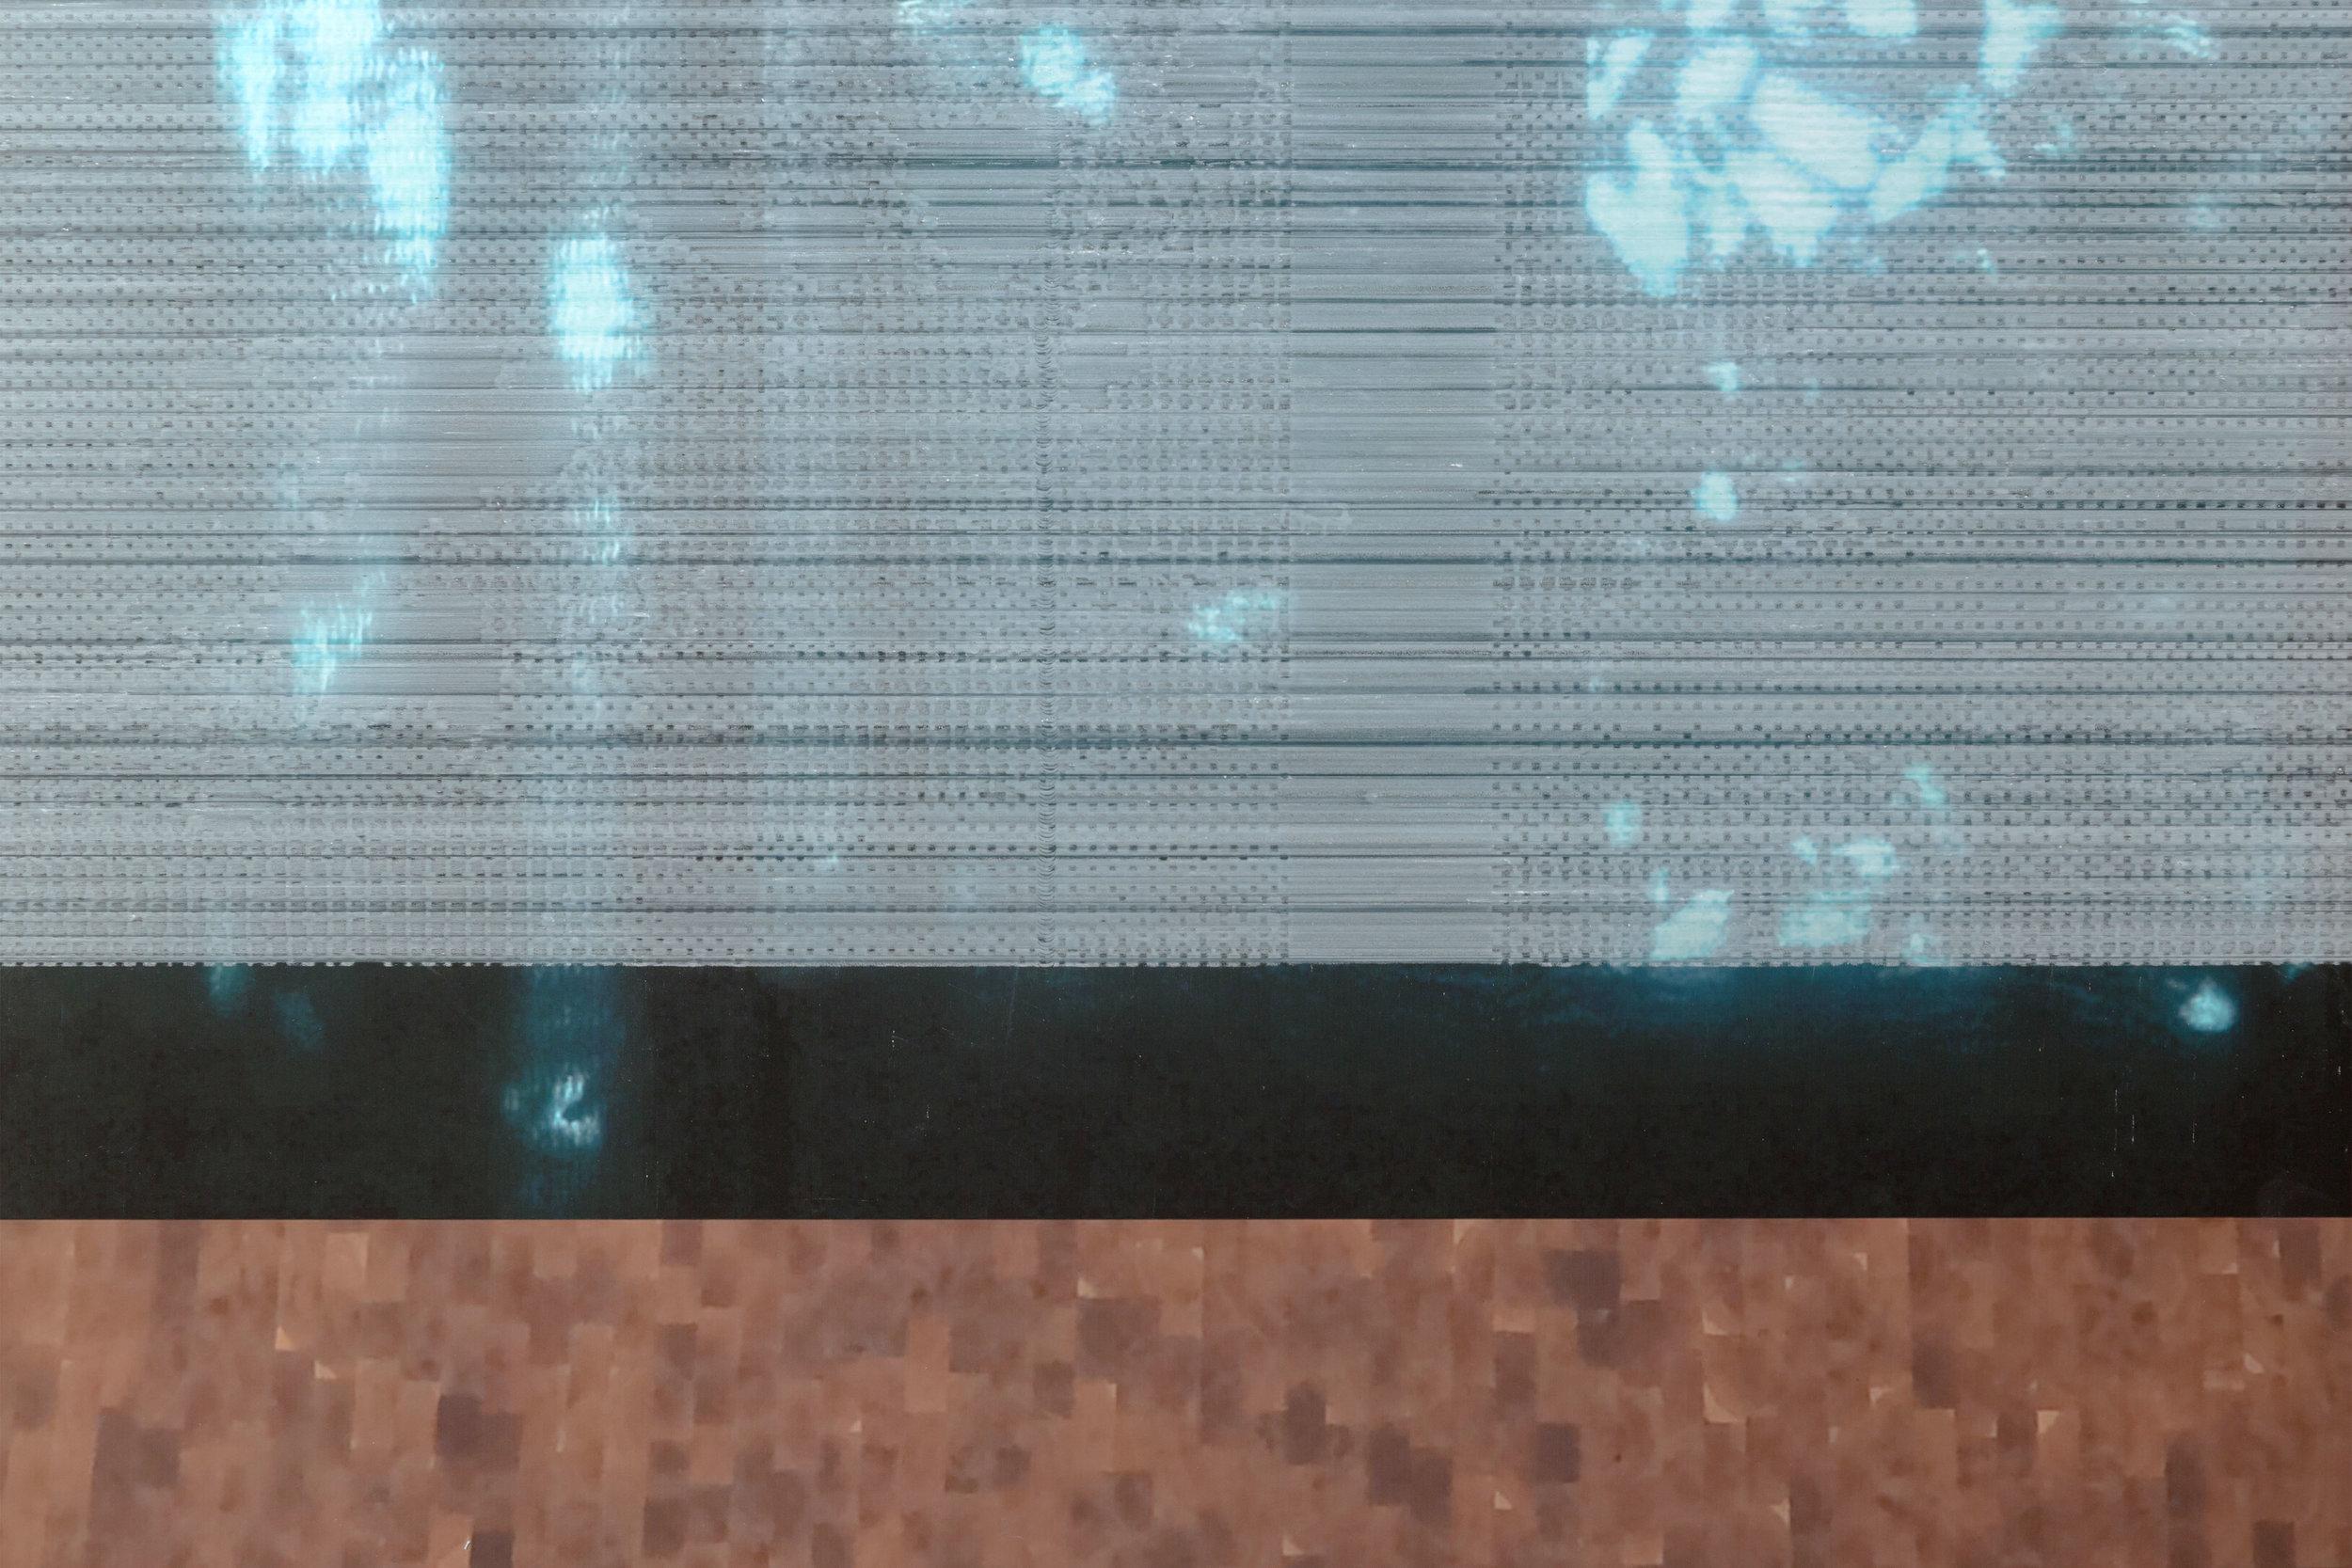 Untitled (veil) (detail)